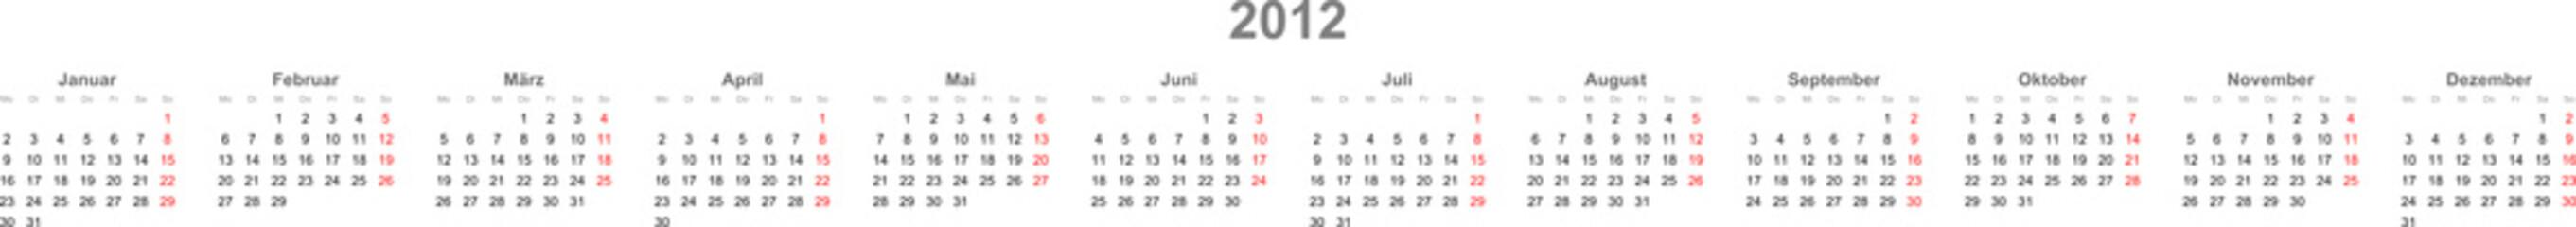 Kalender Zeile 2012